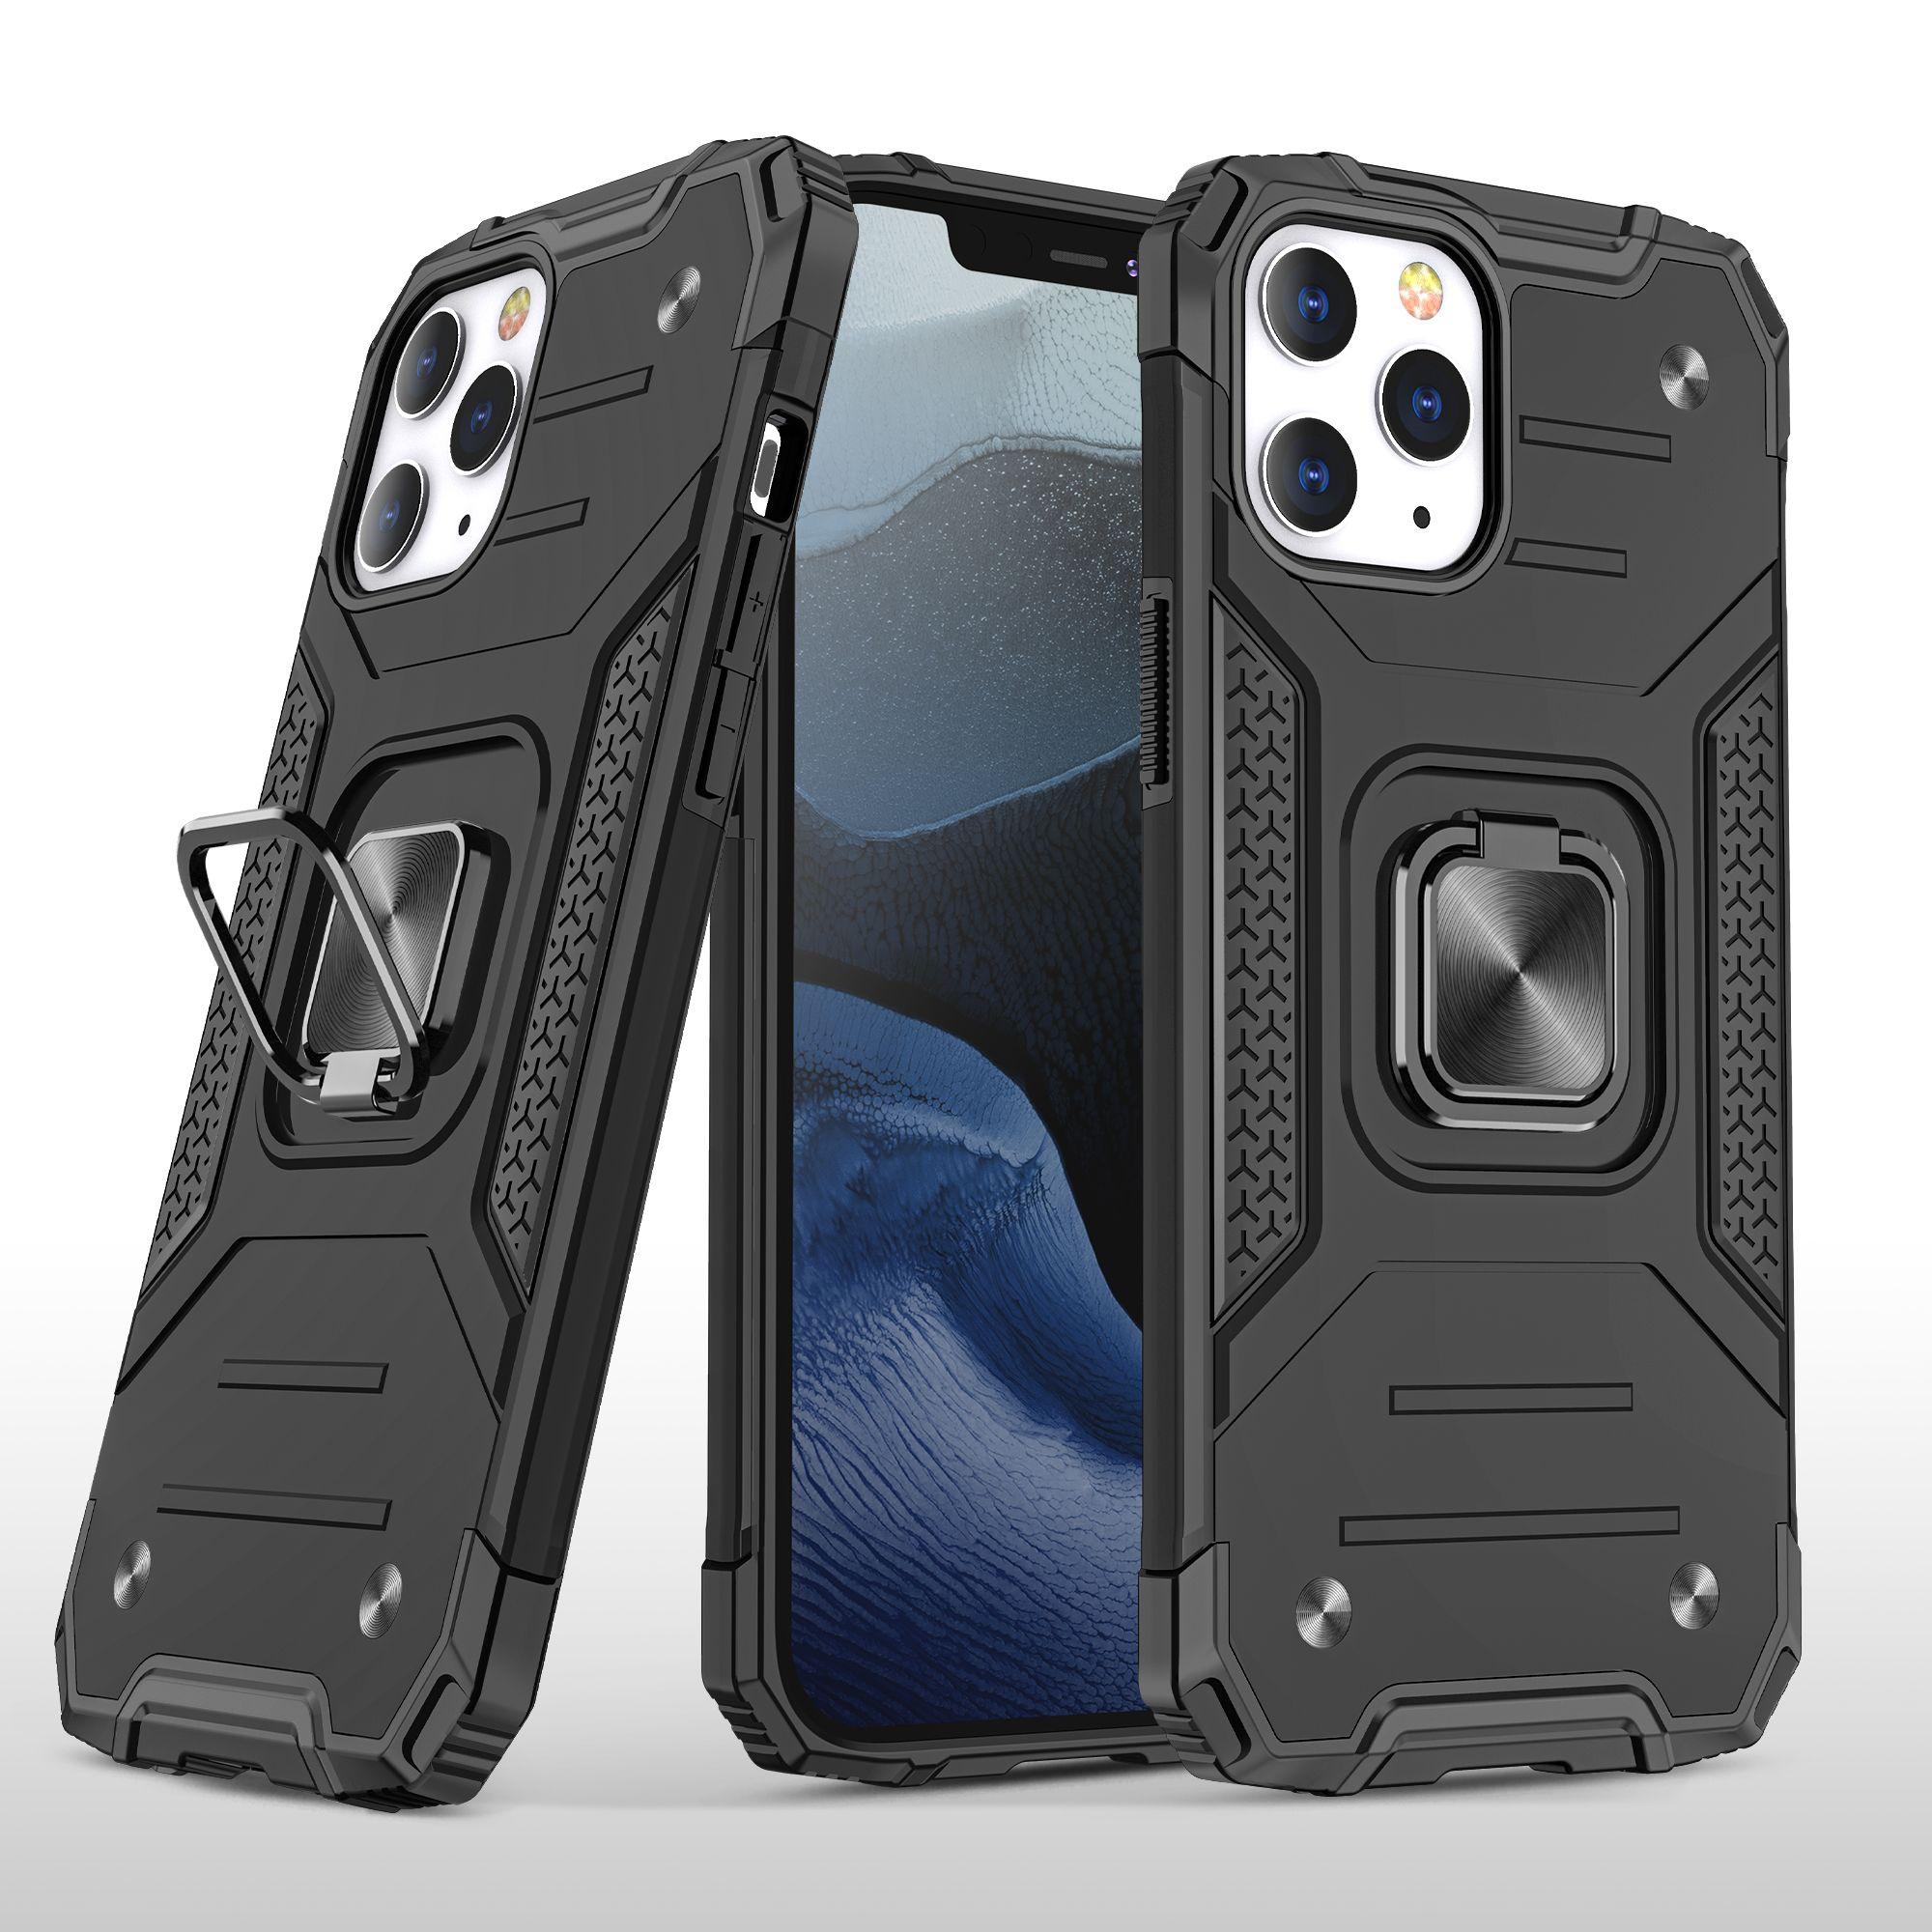 Anti-şok hibrid manyetik döner kickstand zırh kılıf iphone 12 pro max 11 pro max xs max xr x 8 7 6 artı